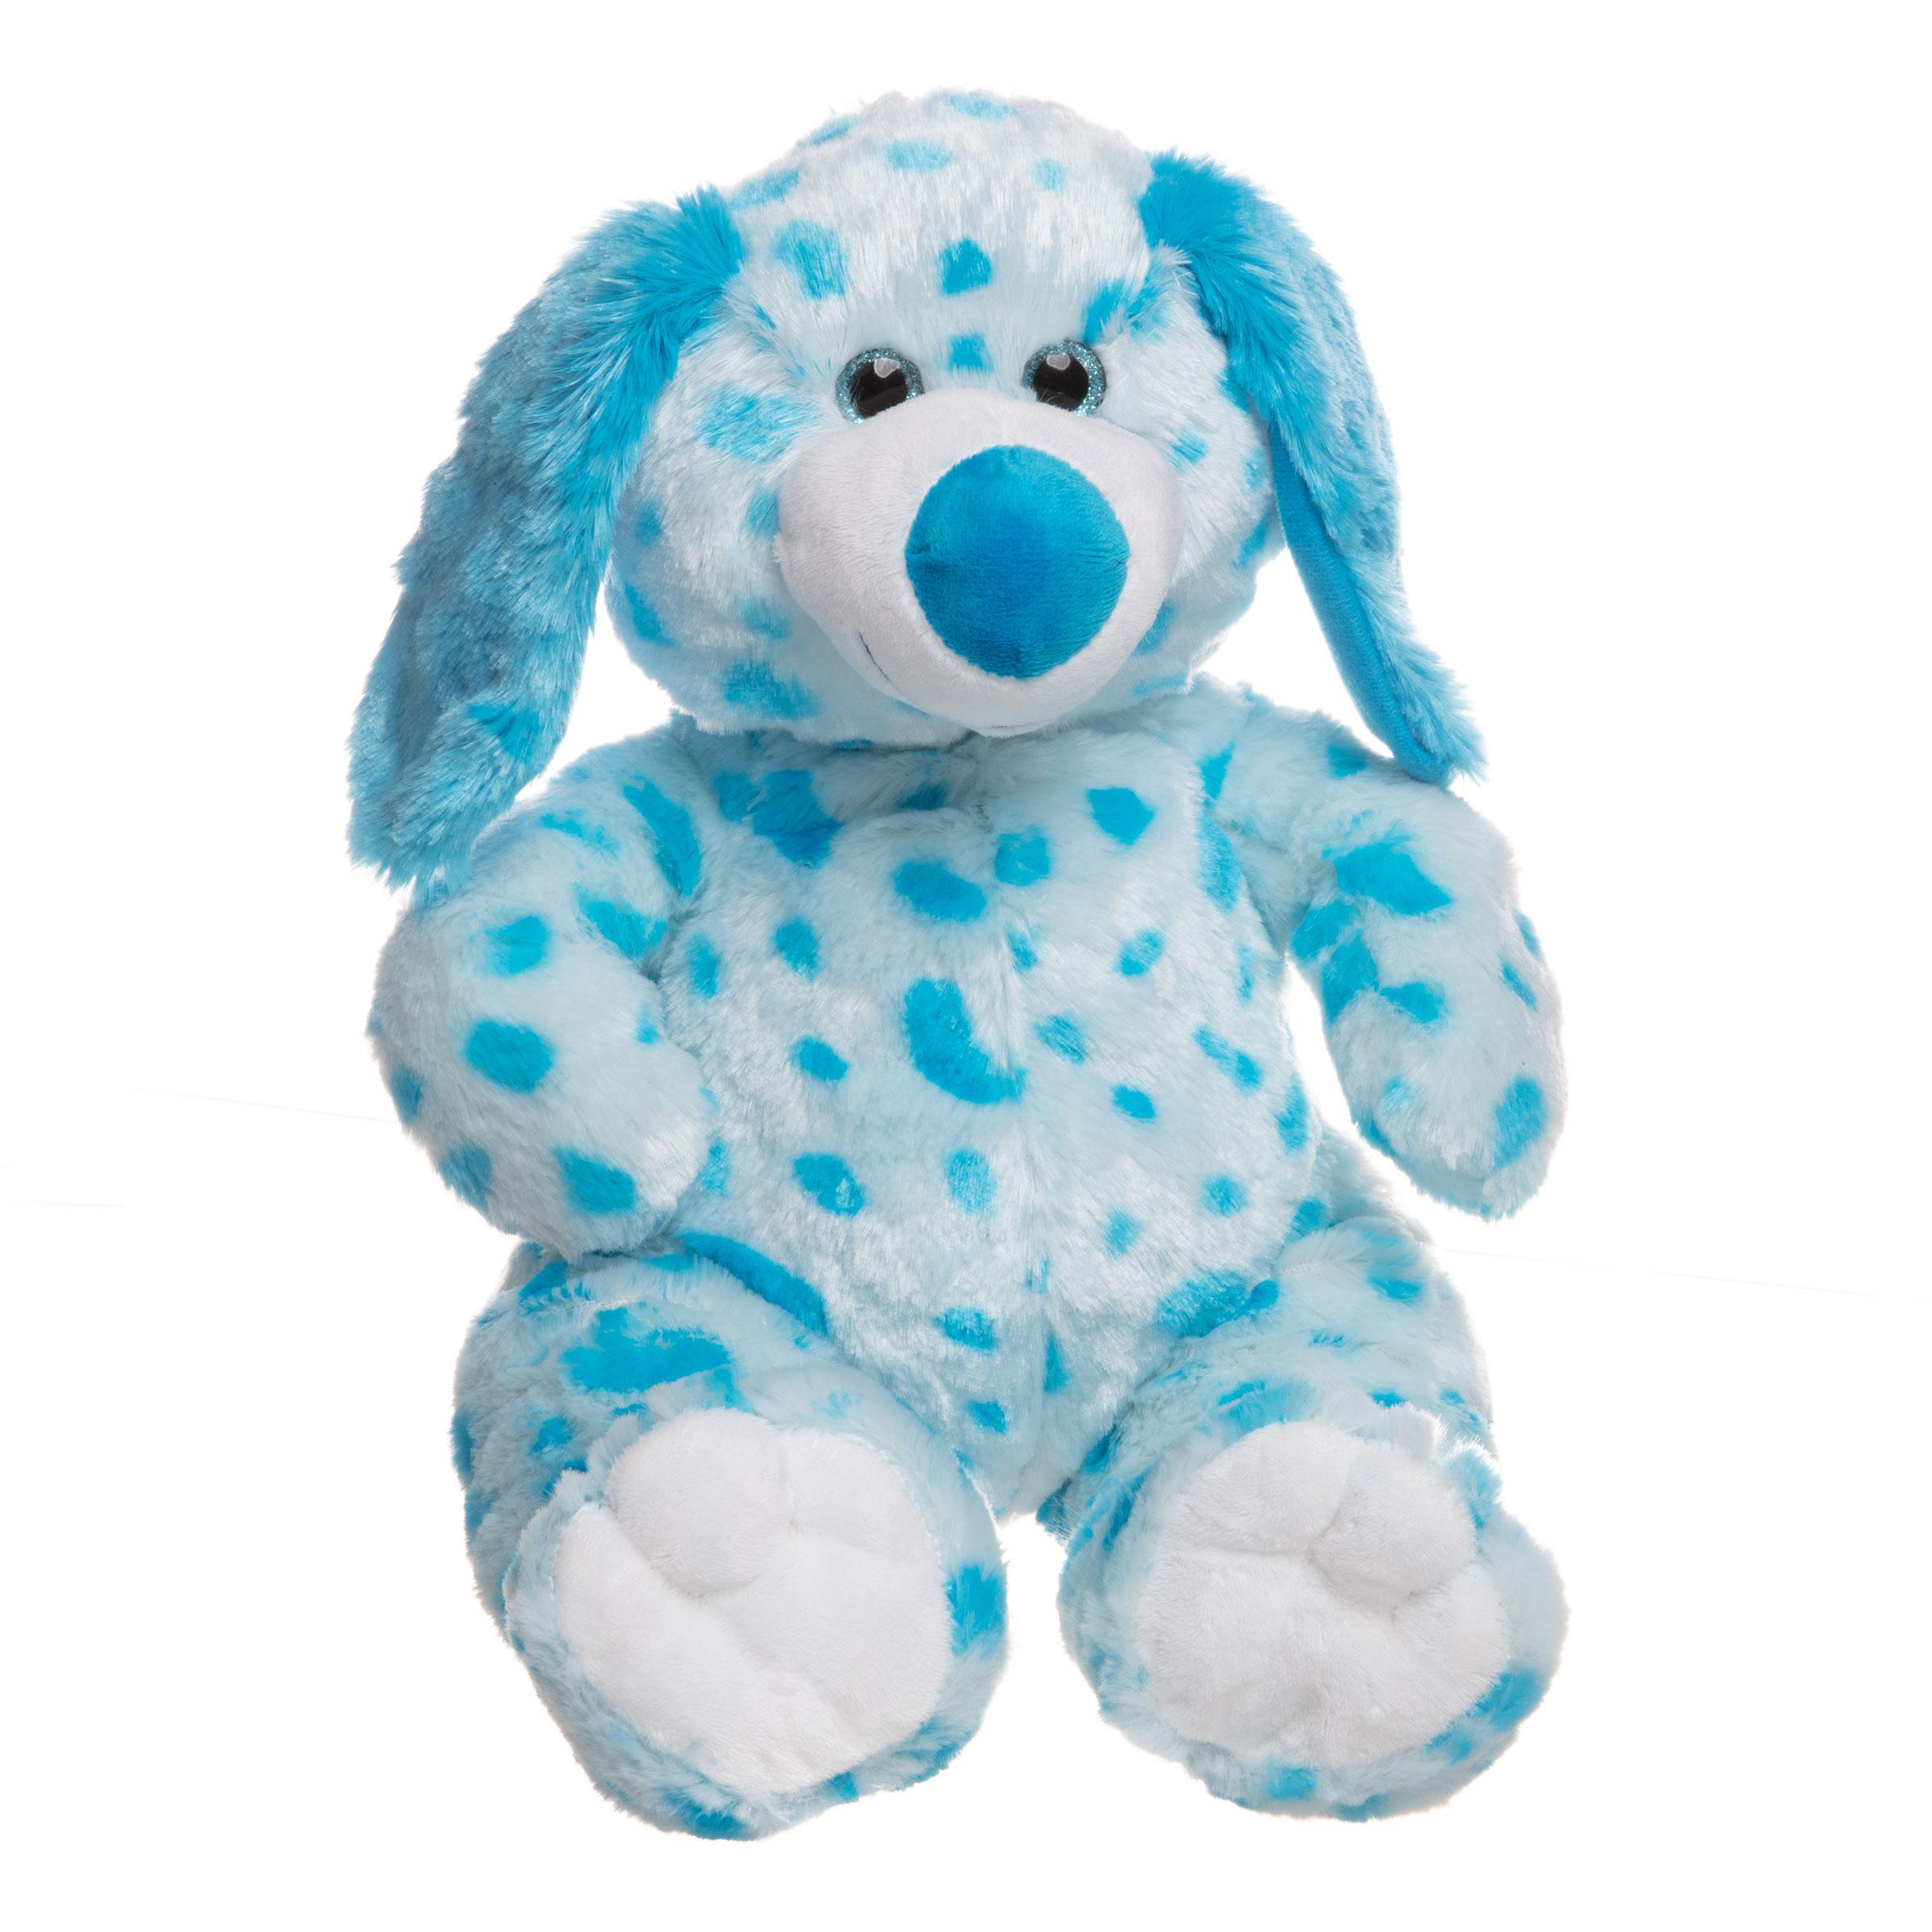 Bluey the Dog Teddy Bear